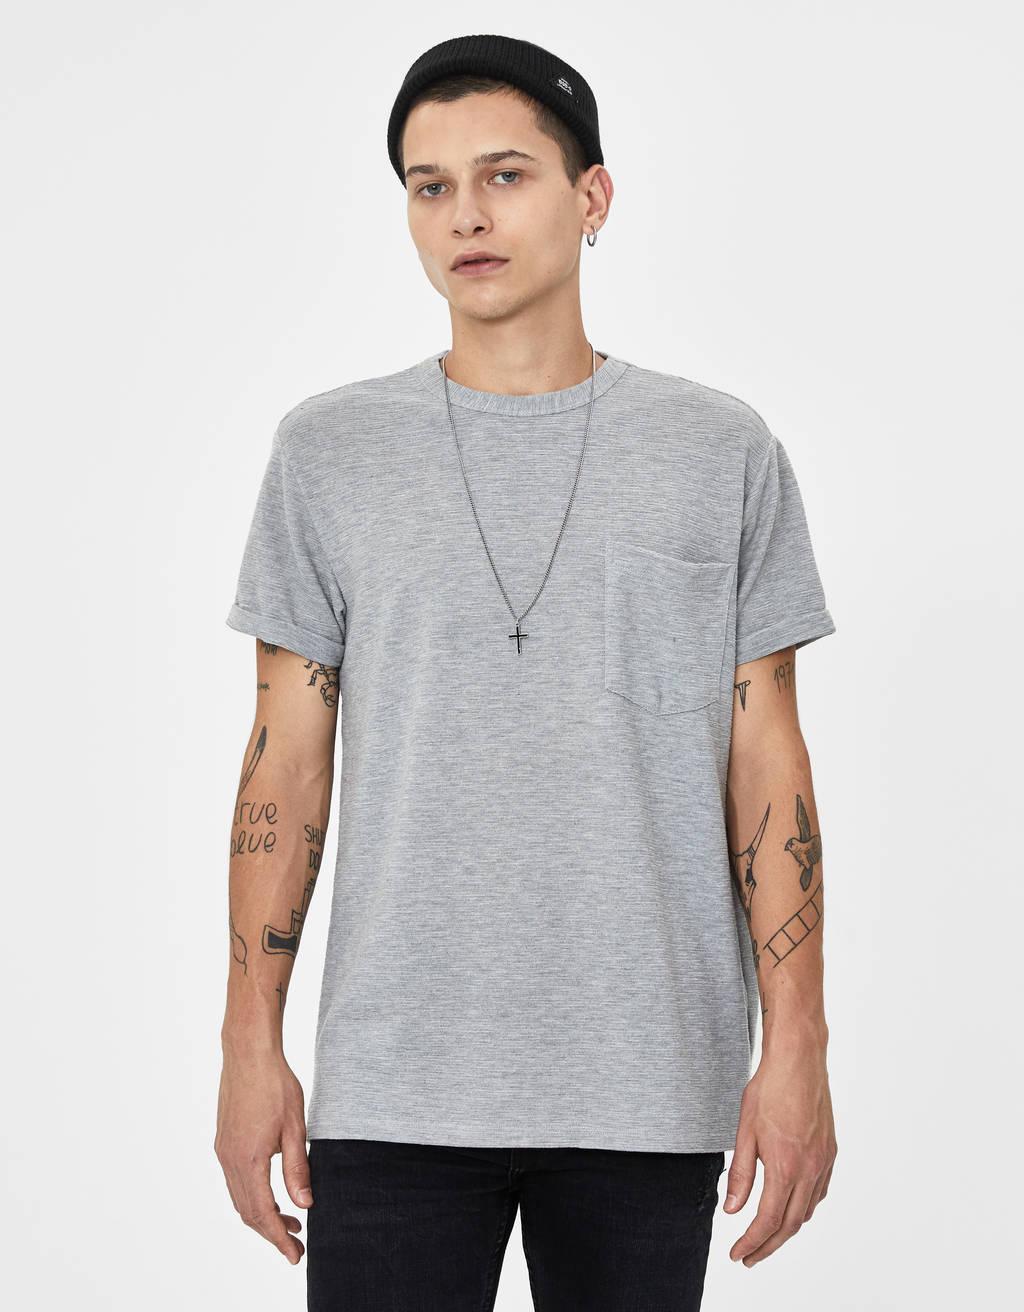 T-shirt com cutwork